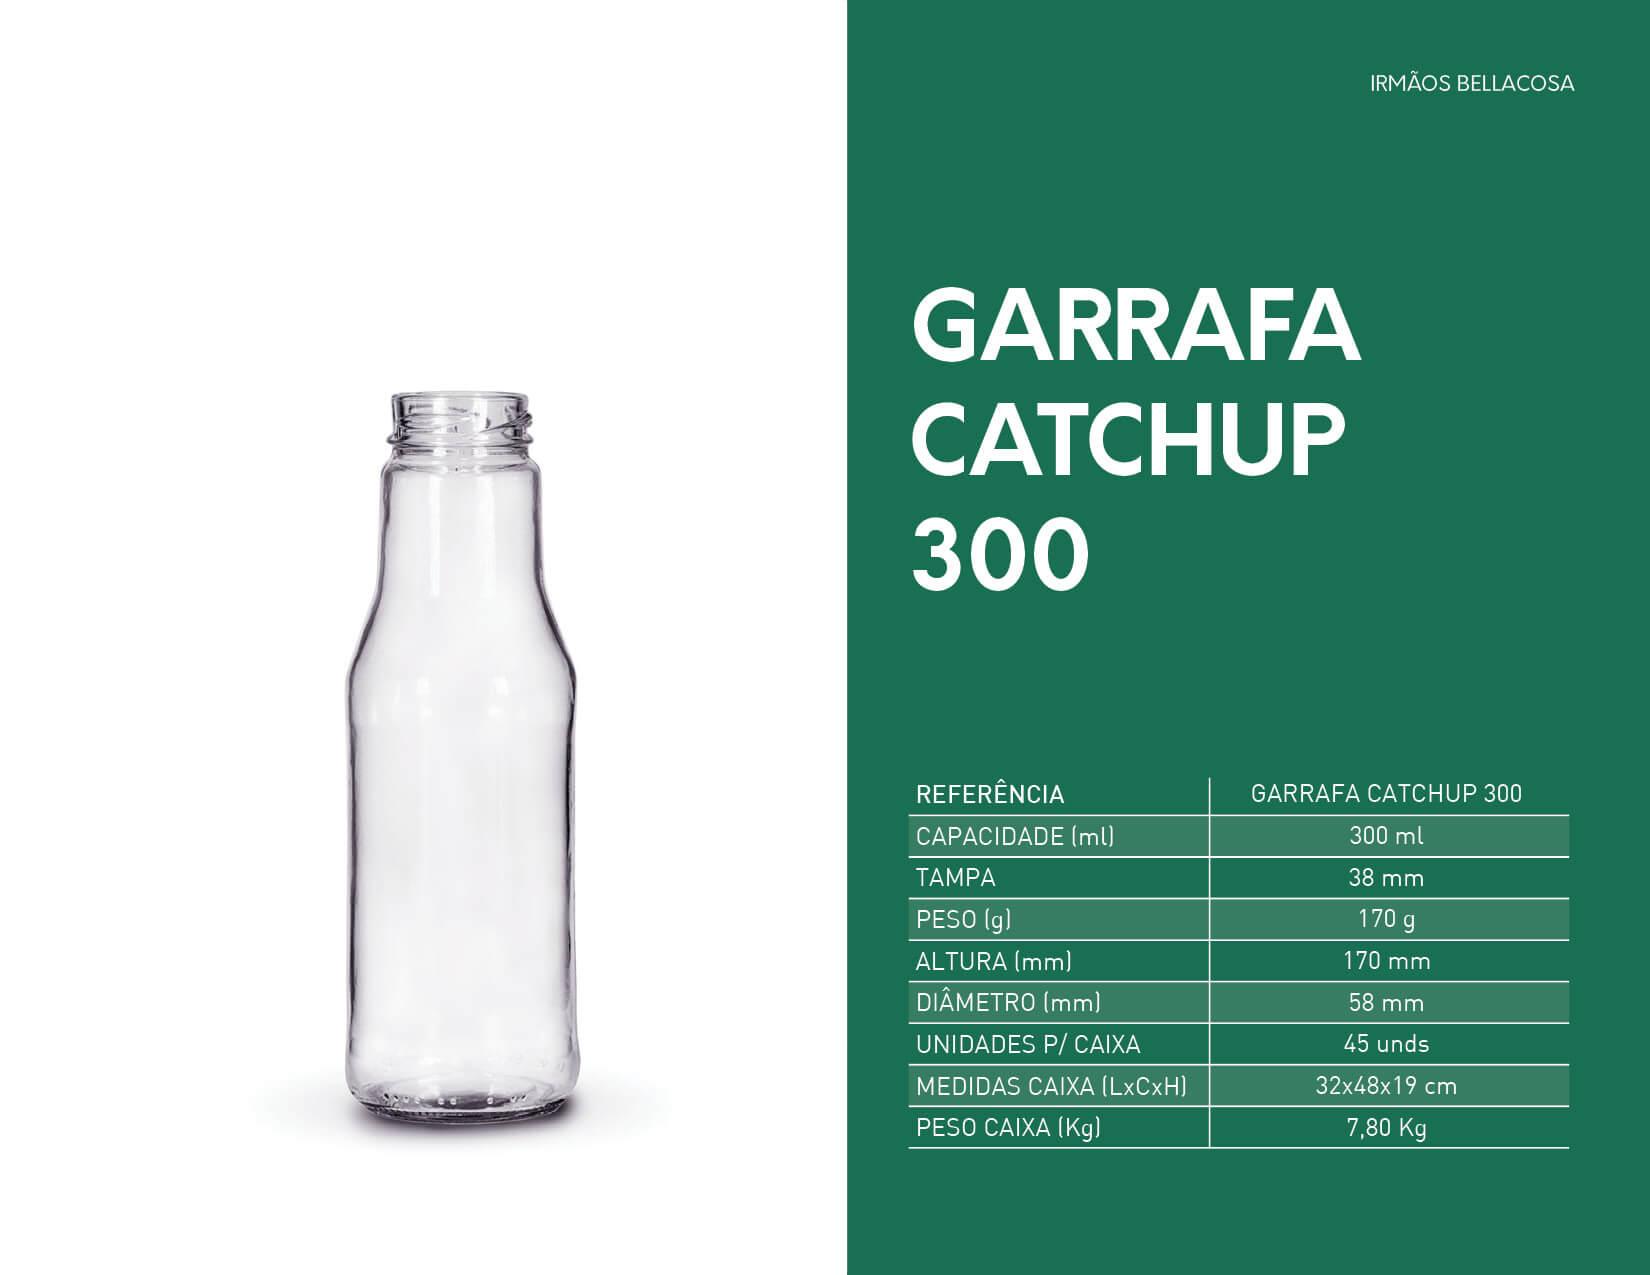 035-Garrafa-Catchup-300-irmaos-bellacosa-embalagens-de-vidro